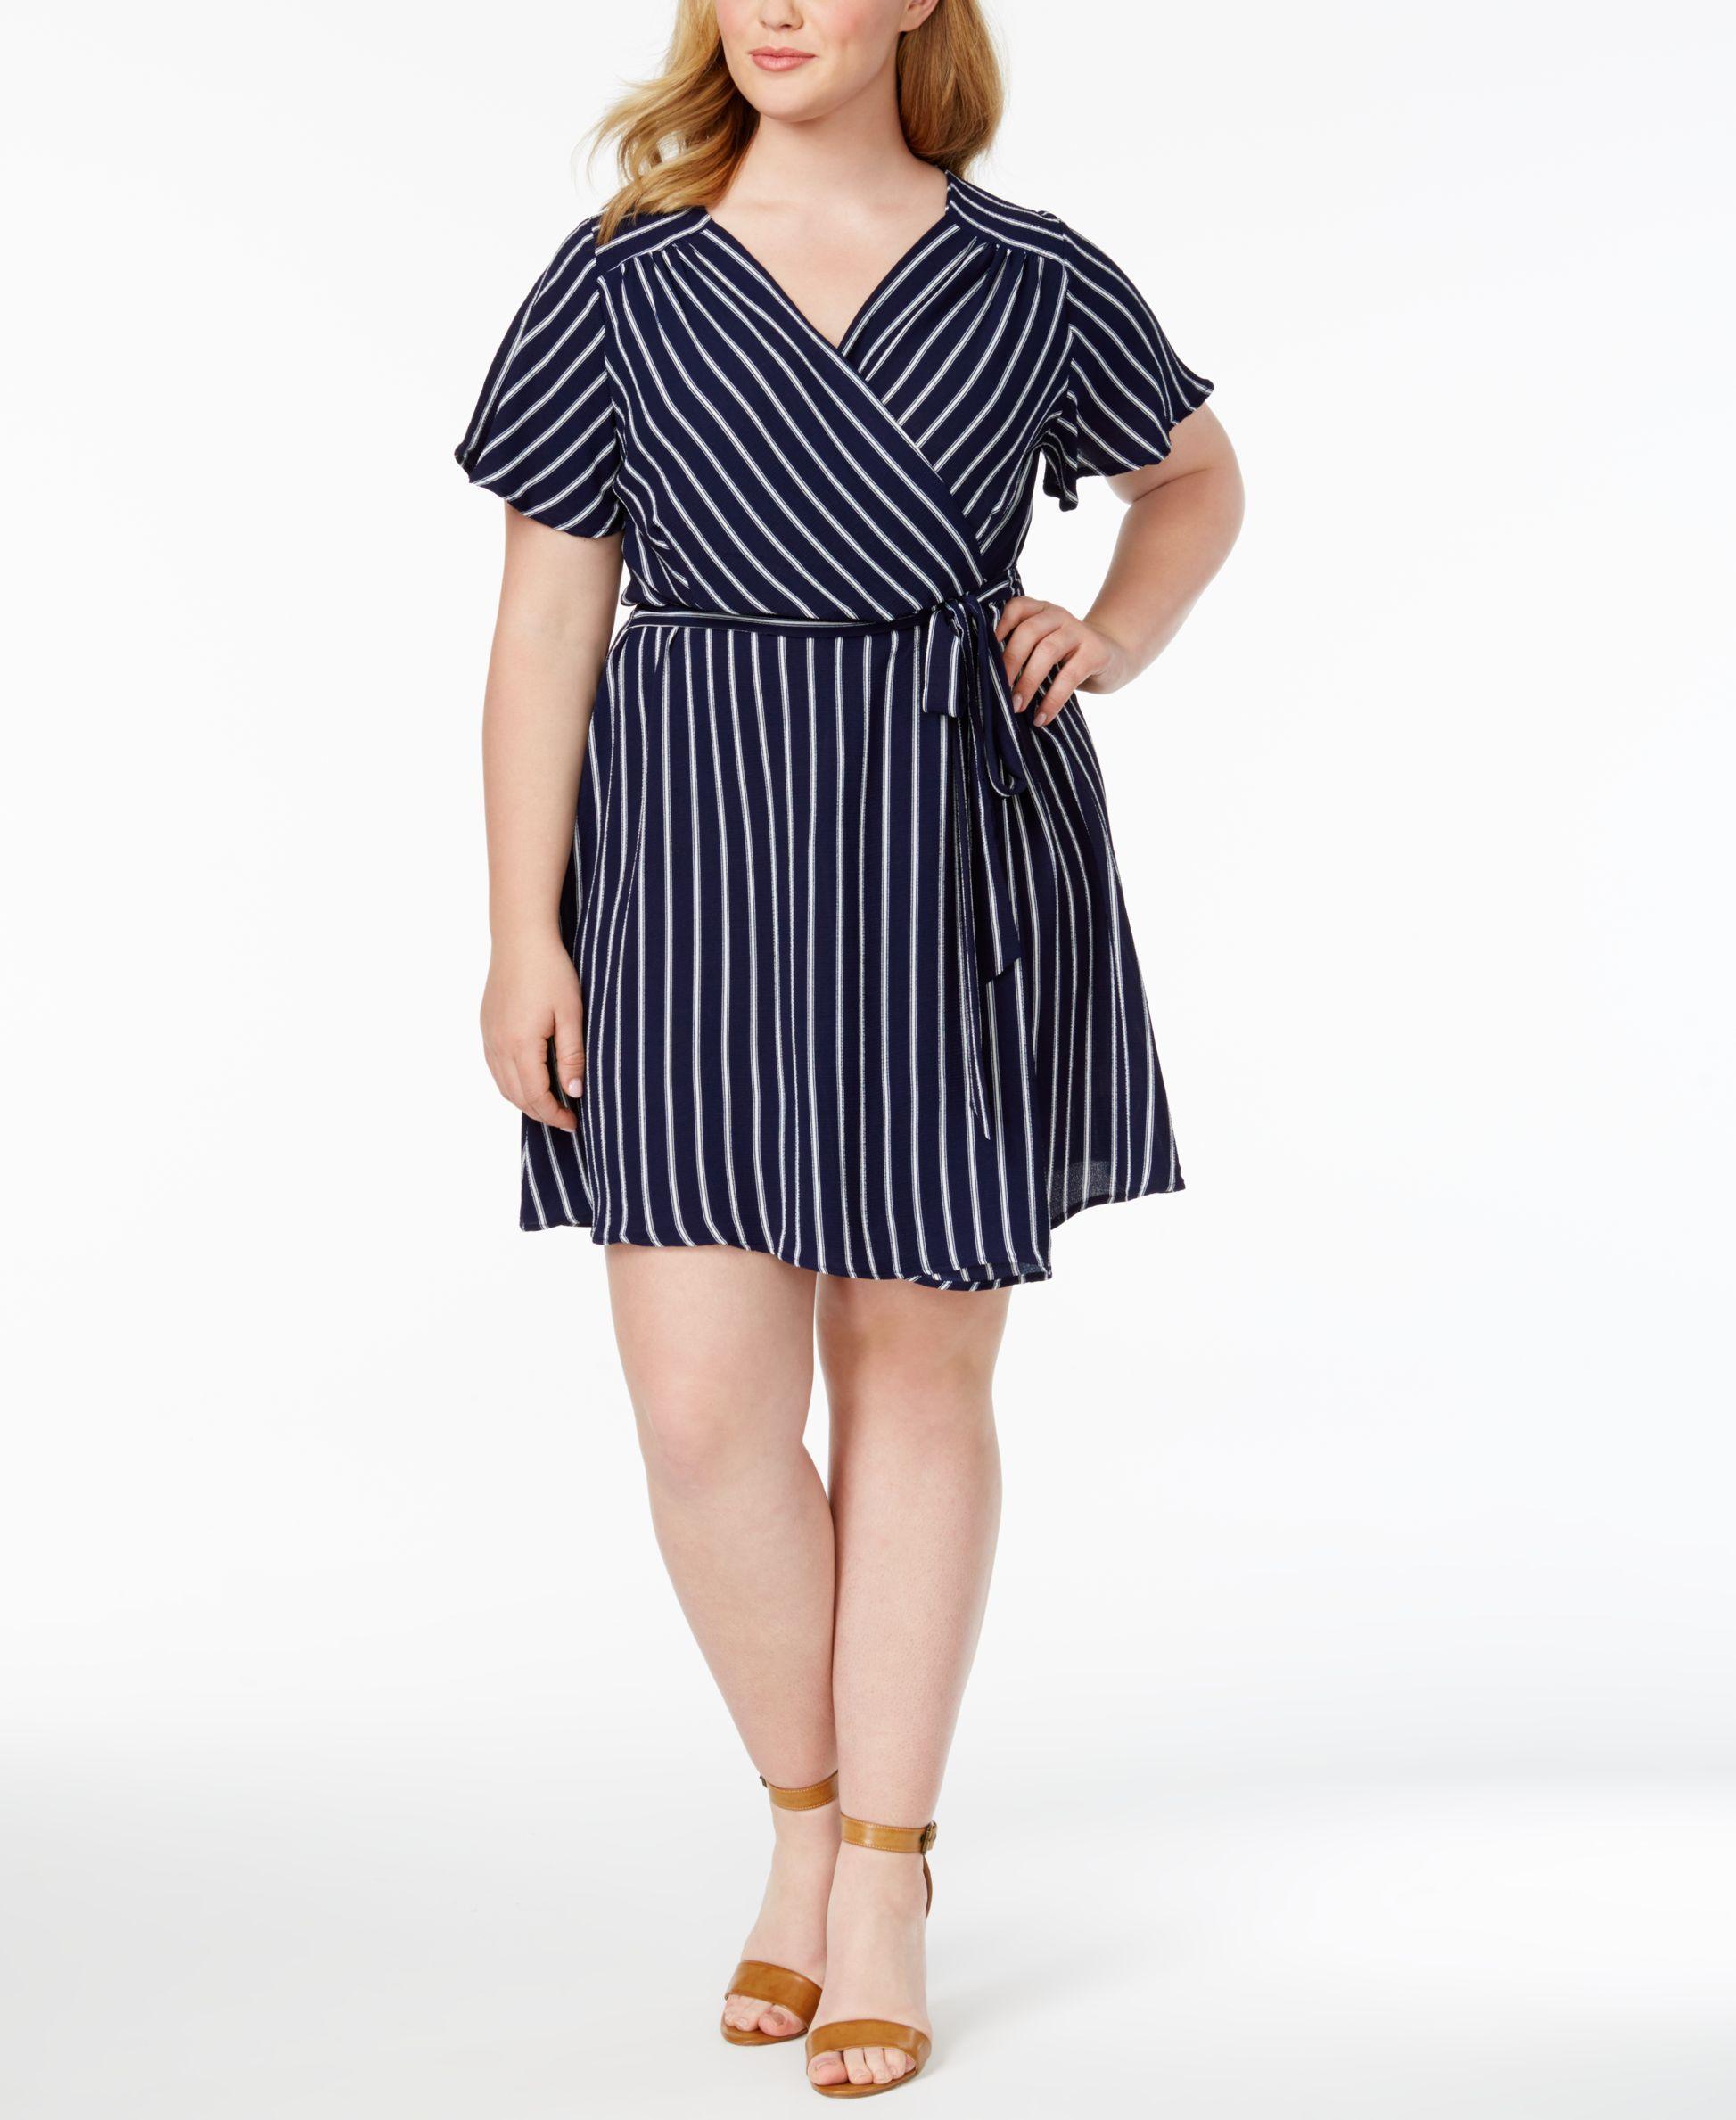 c12906cff0f Monteau Trendy Plus Size Striped Faux-Wrap Dress